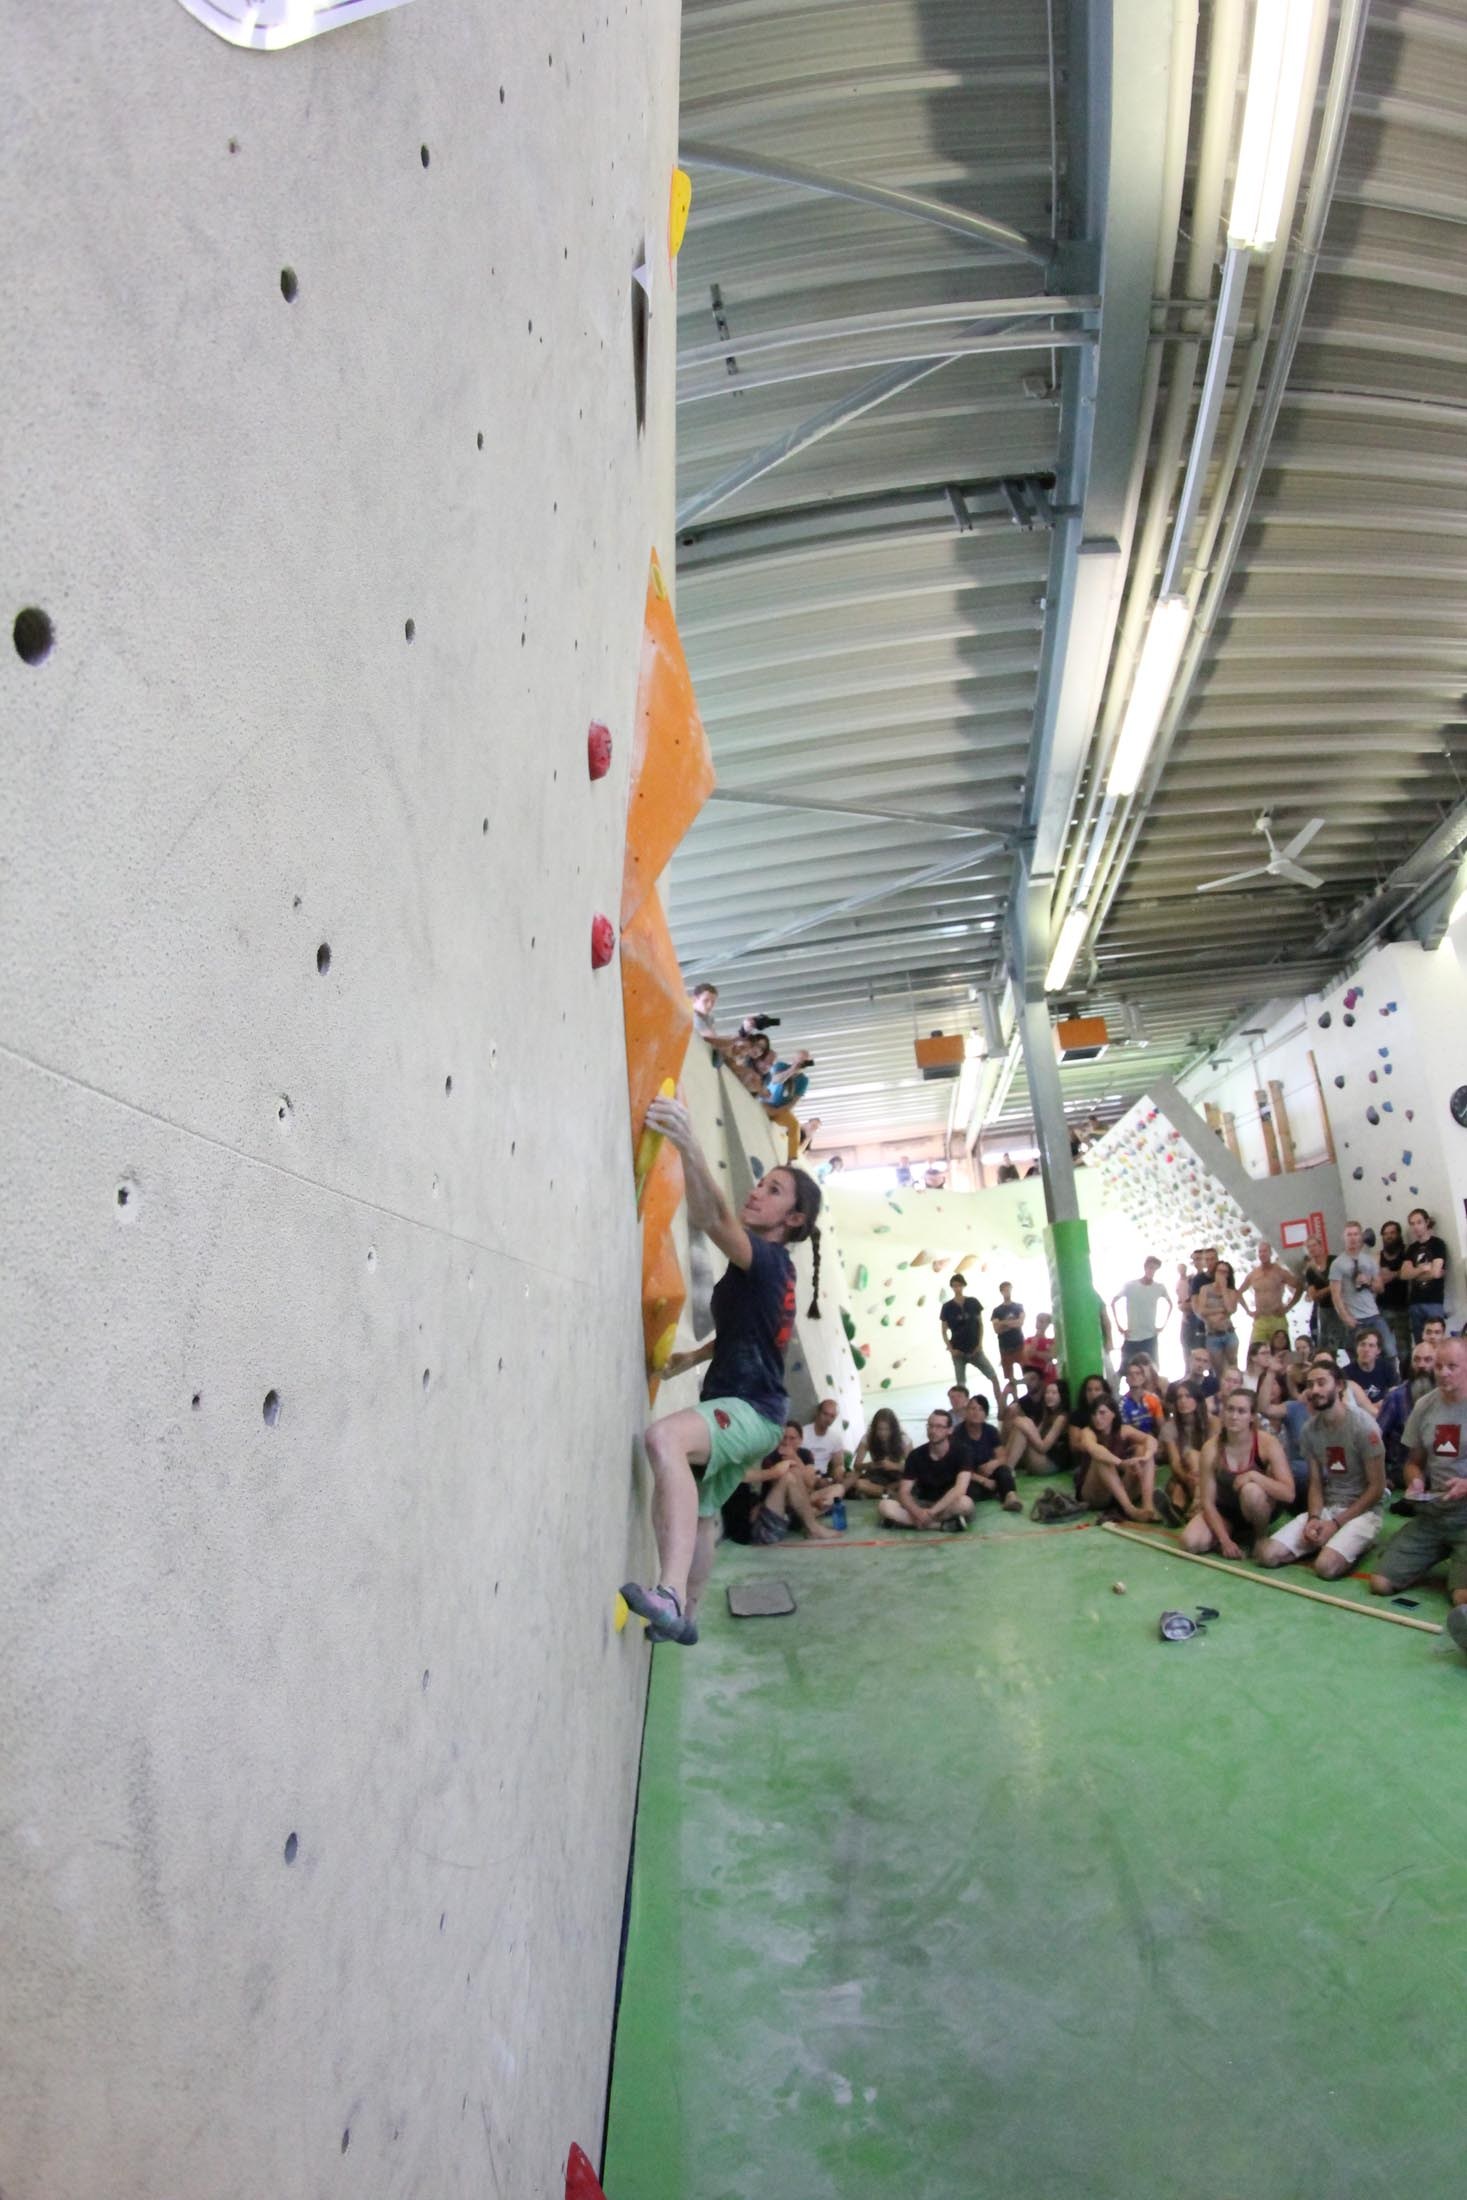 Finale, internationaler bouldercup Frankenjura 2016, BLOCKHELDEN Erlangen, Mammut, Bergfreunde.de, Boulderwettkampf07092016475